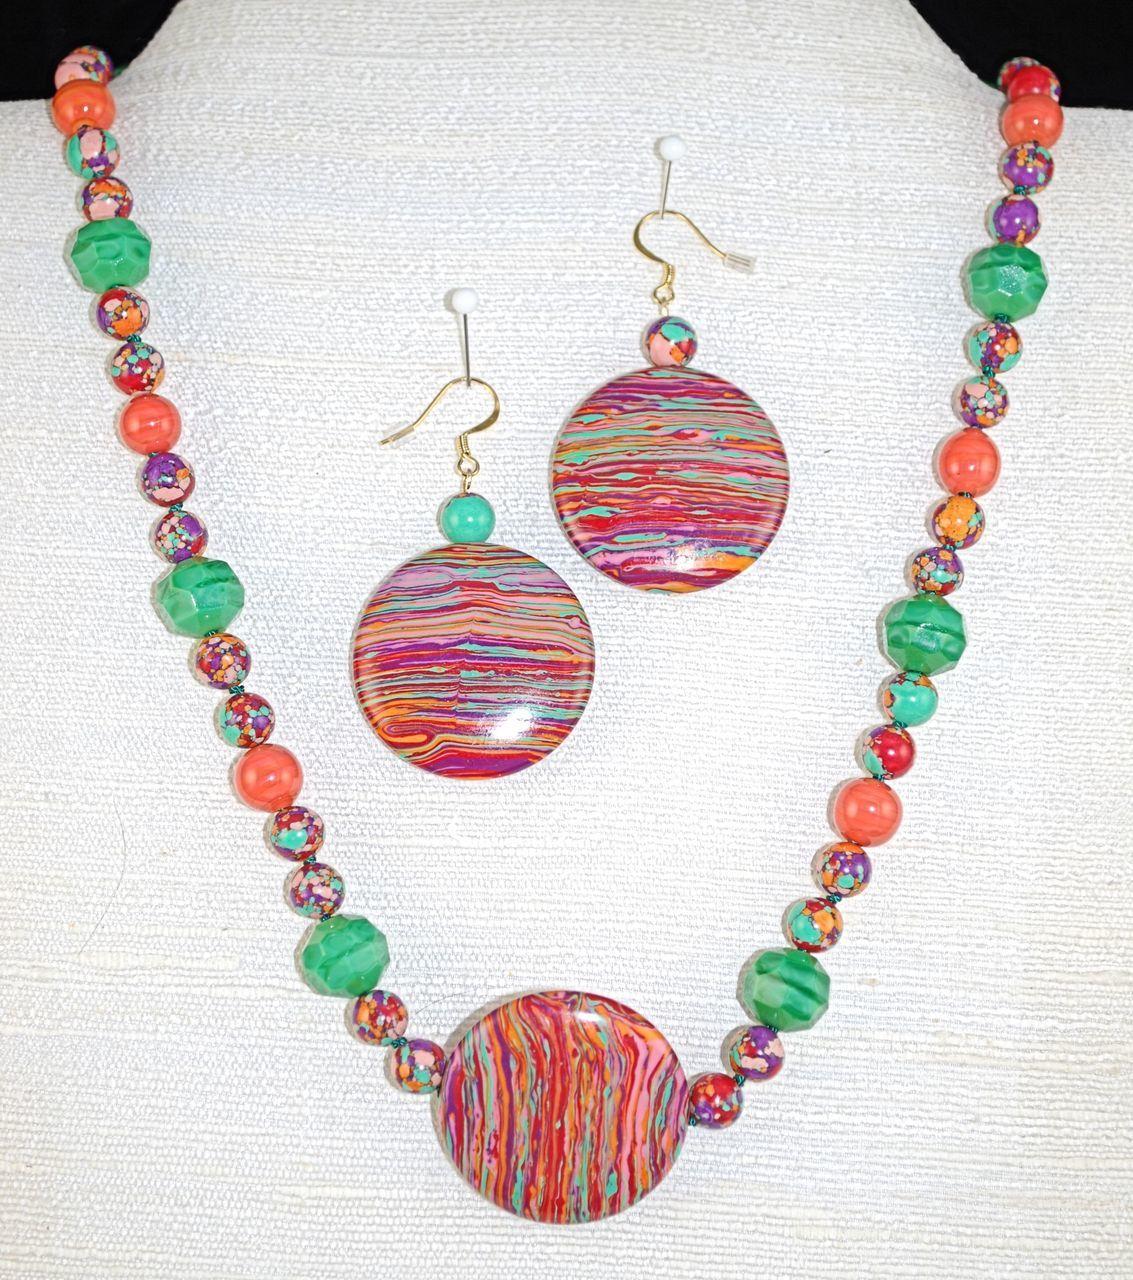 Enchanting Jewelry Creations image 4